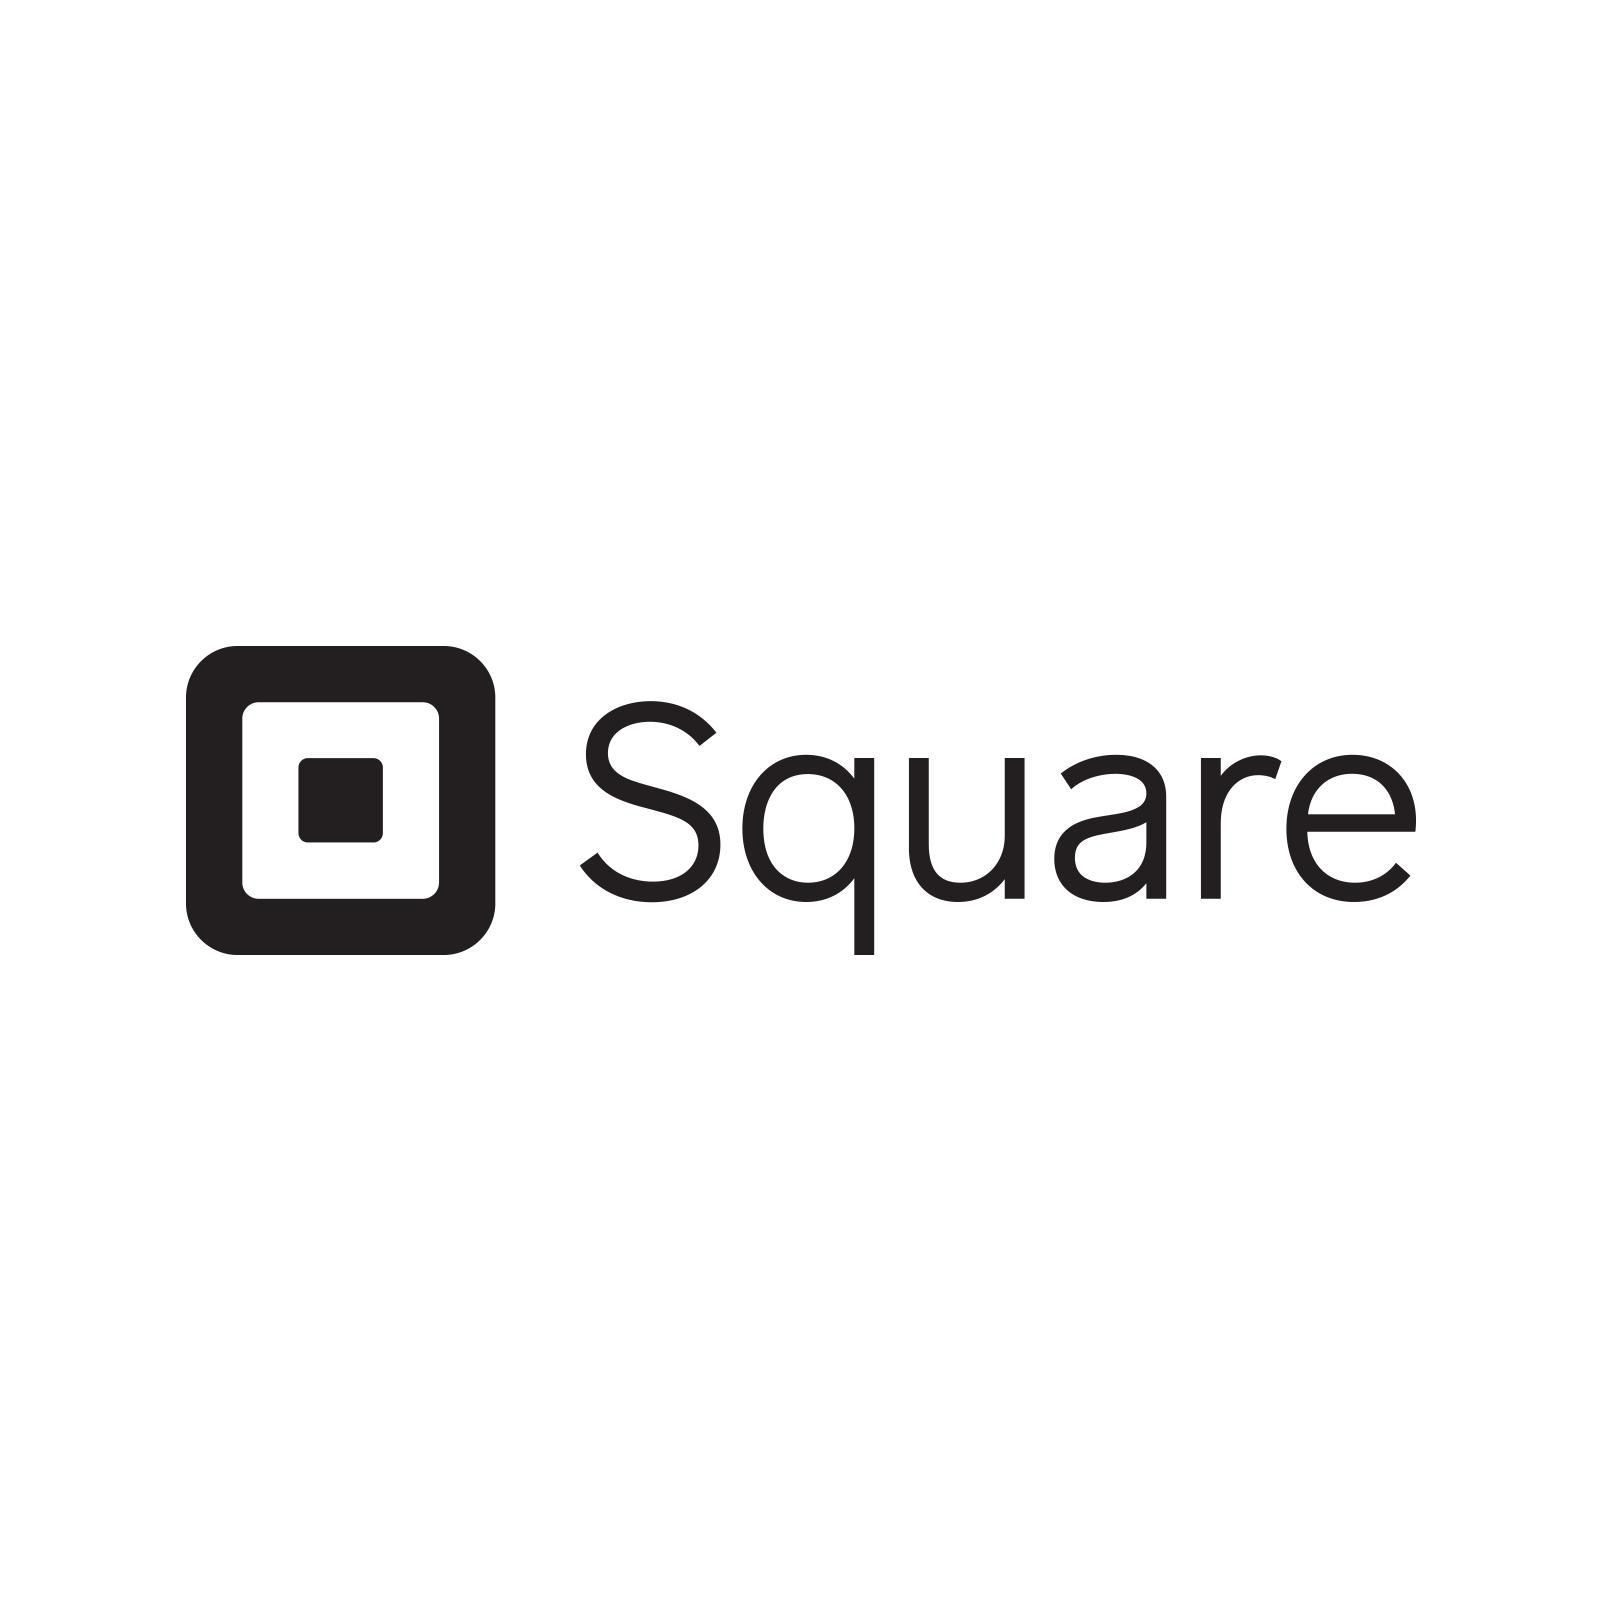 square continued swipe fee litigations increase business model risk